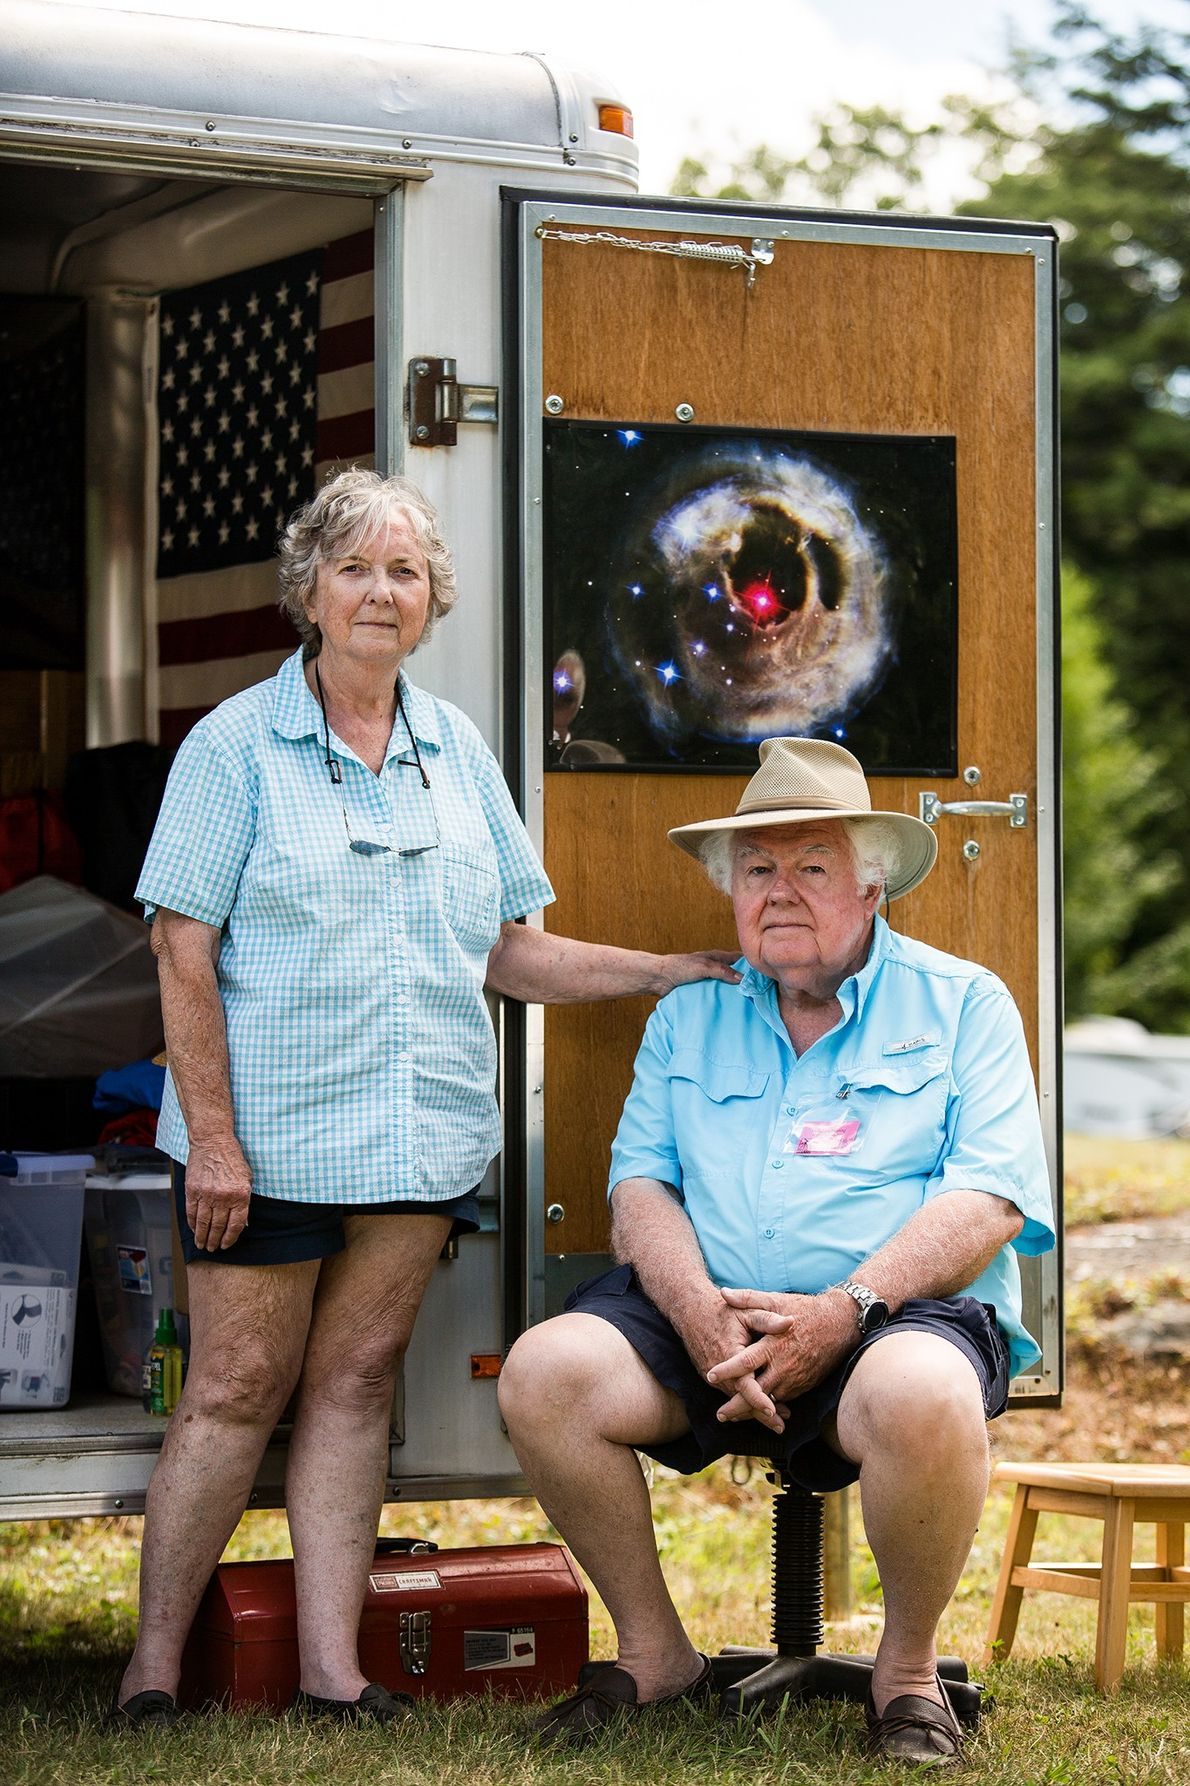 Dee e Roy Diffrient, oriundos de Monkton, Maryland, comemoraram 25 anos de presença no festival Stellafane.